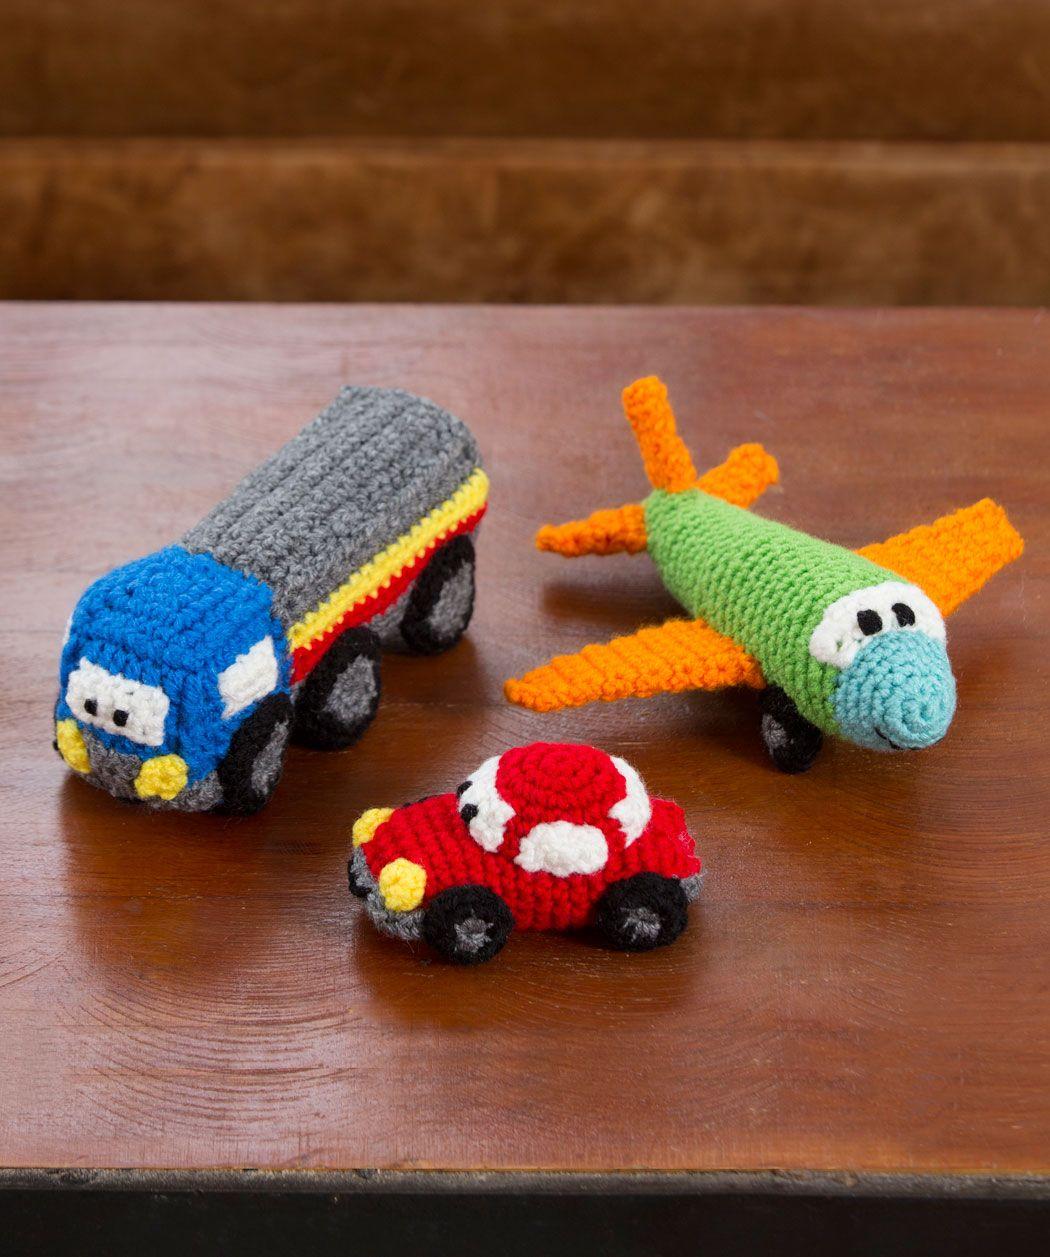 Amigurumi Free Pattern Car : DIY Car, Plane and Truck Amigurumi Toys - FREE Crochet ...